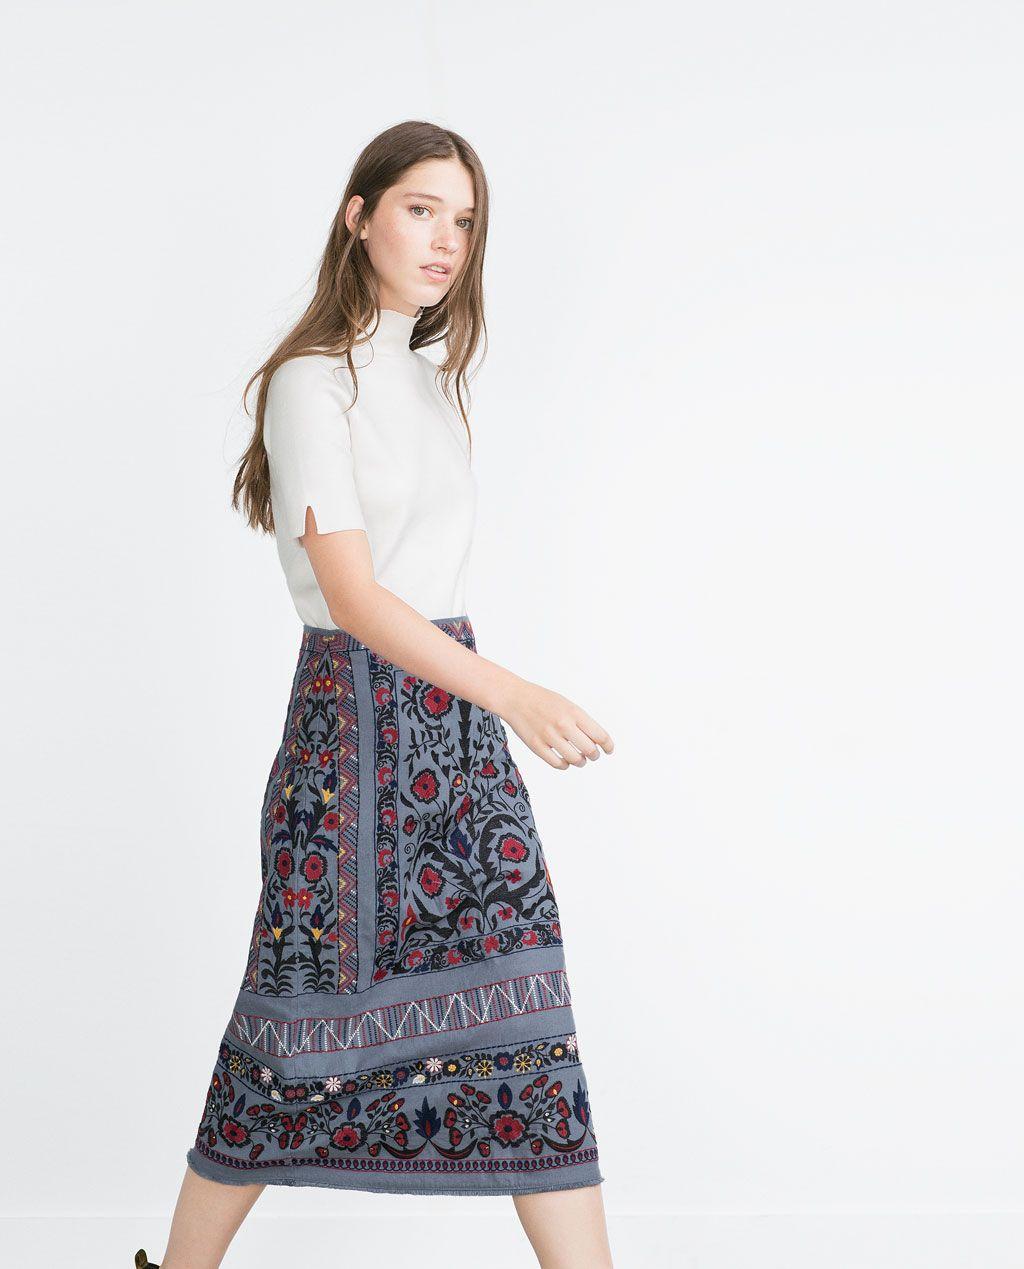 14f9f303a ZARA - WOMAN - MID-LENGTH EMBROIDERED SKIRT | Fashion Wishlist ...